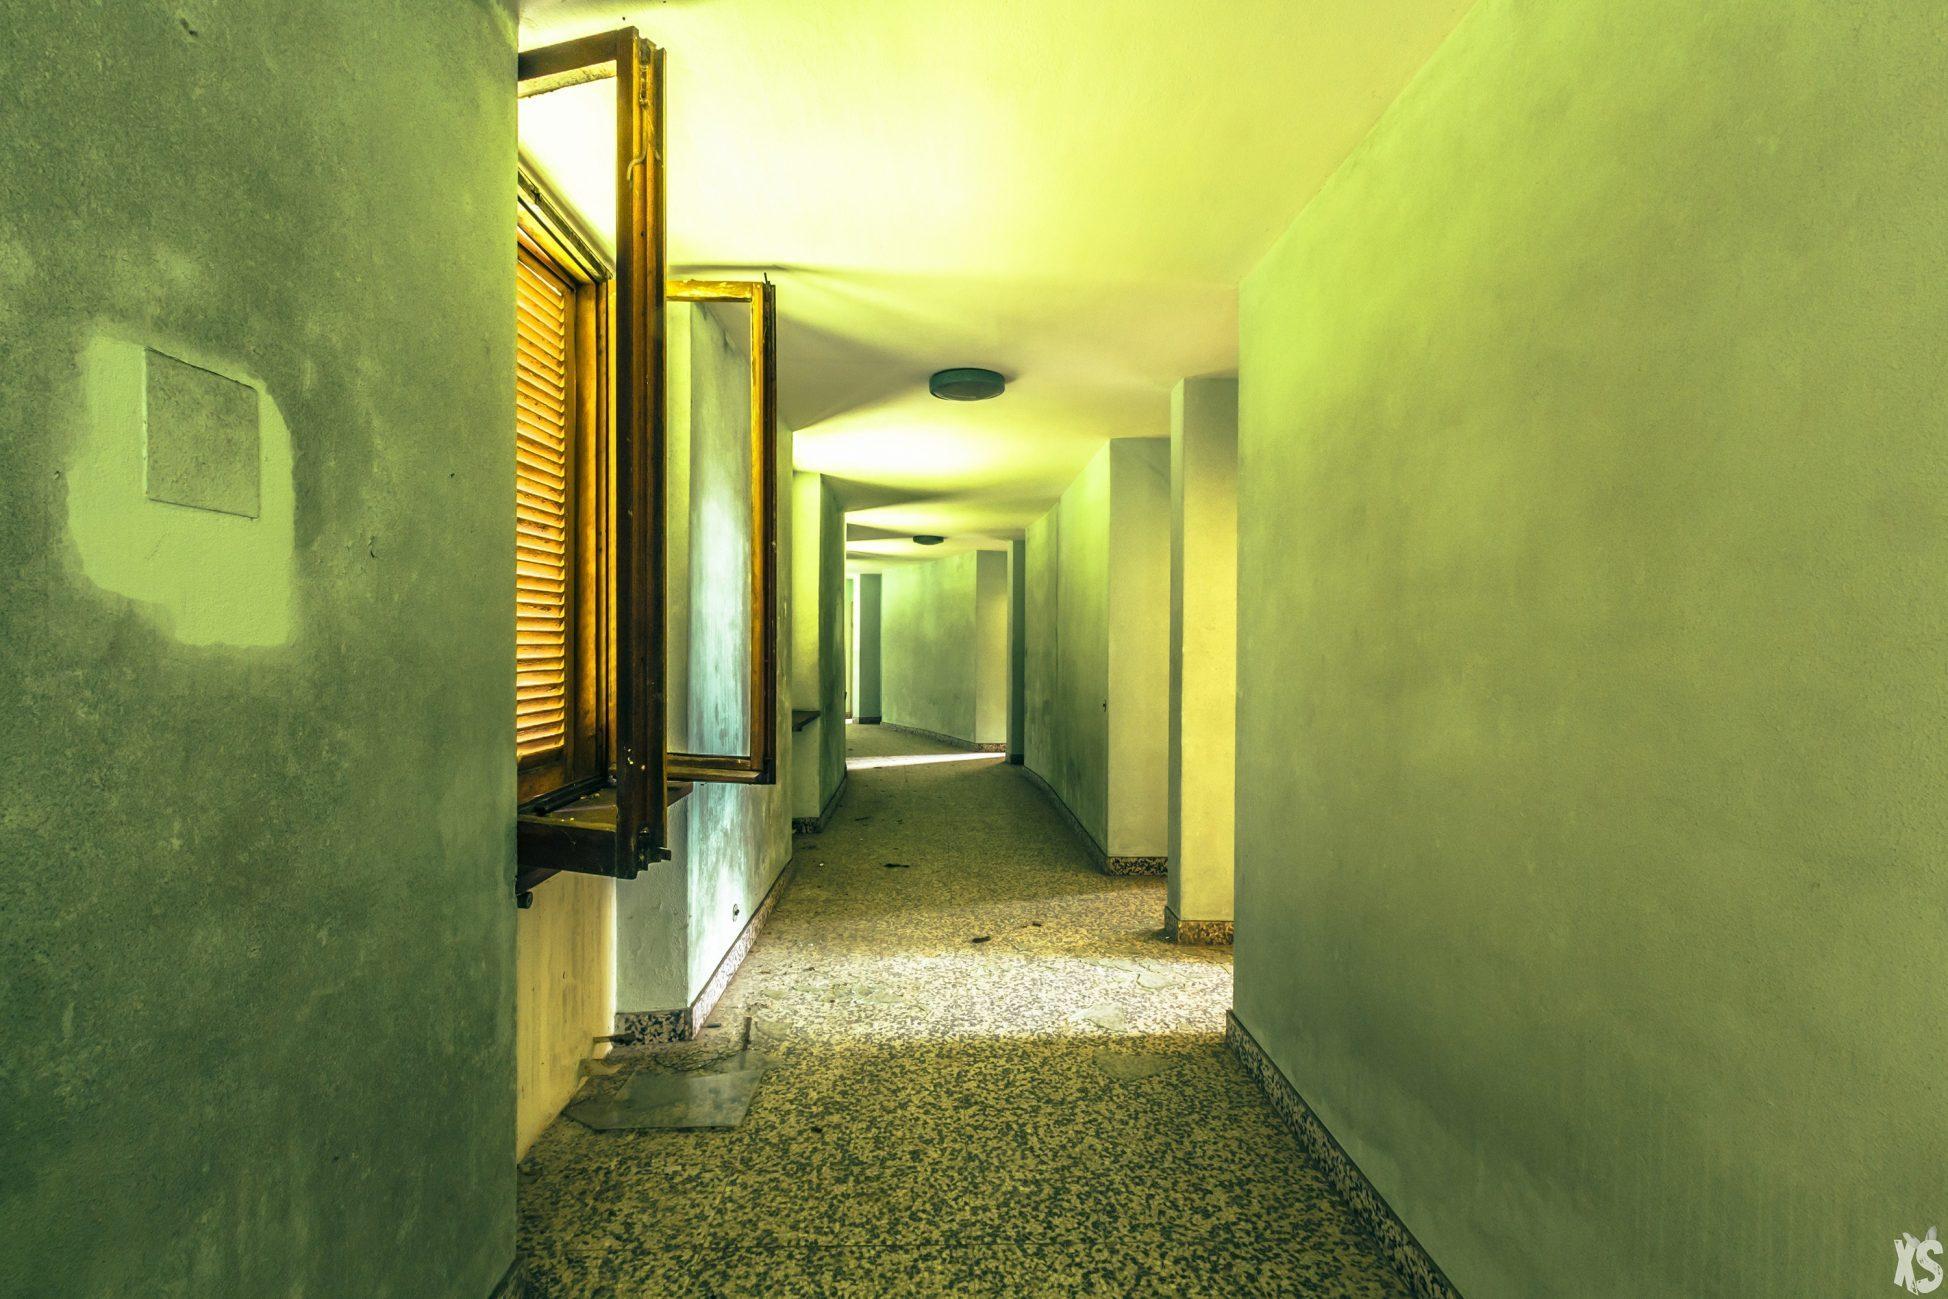 sanctuaire-bertha-gifford-3